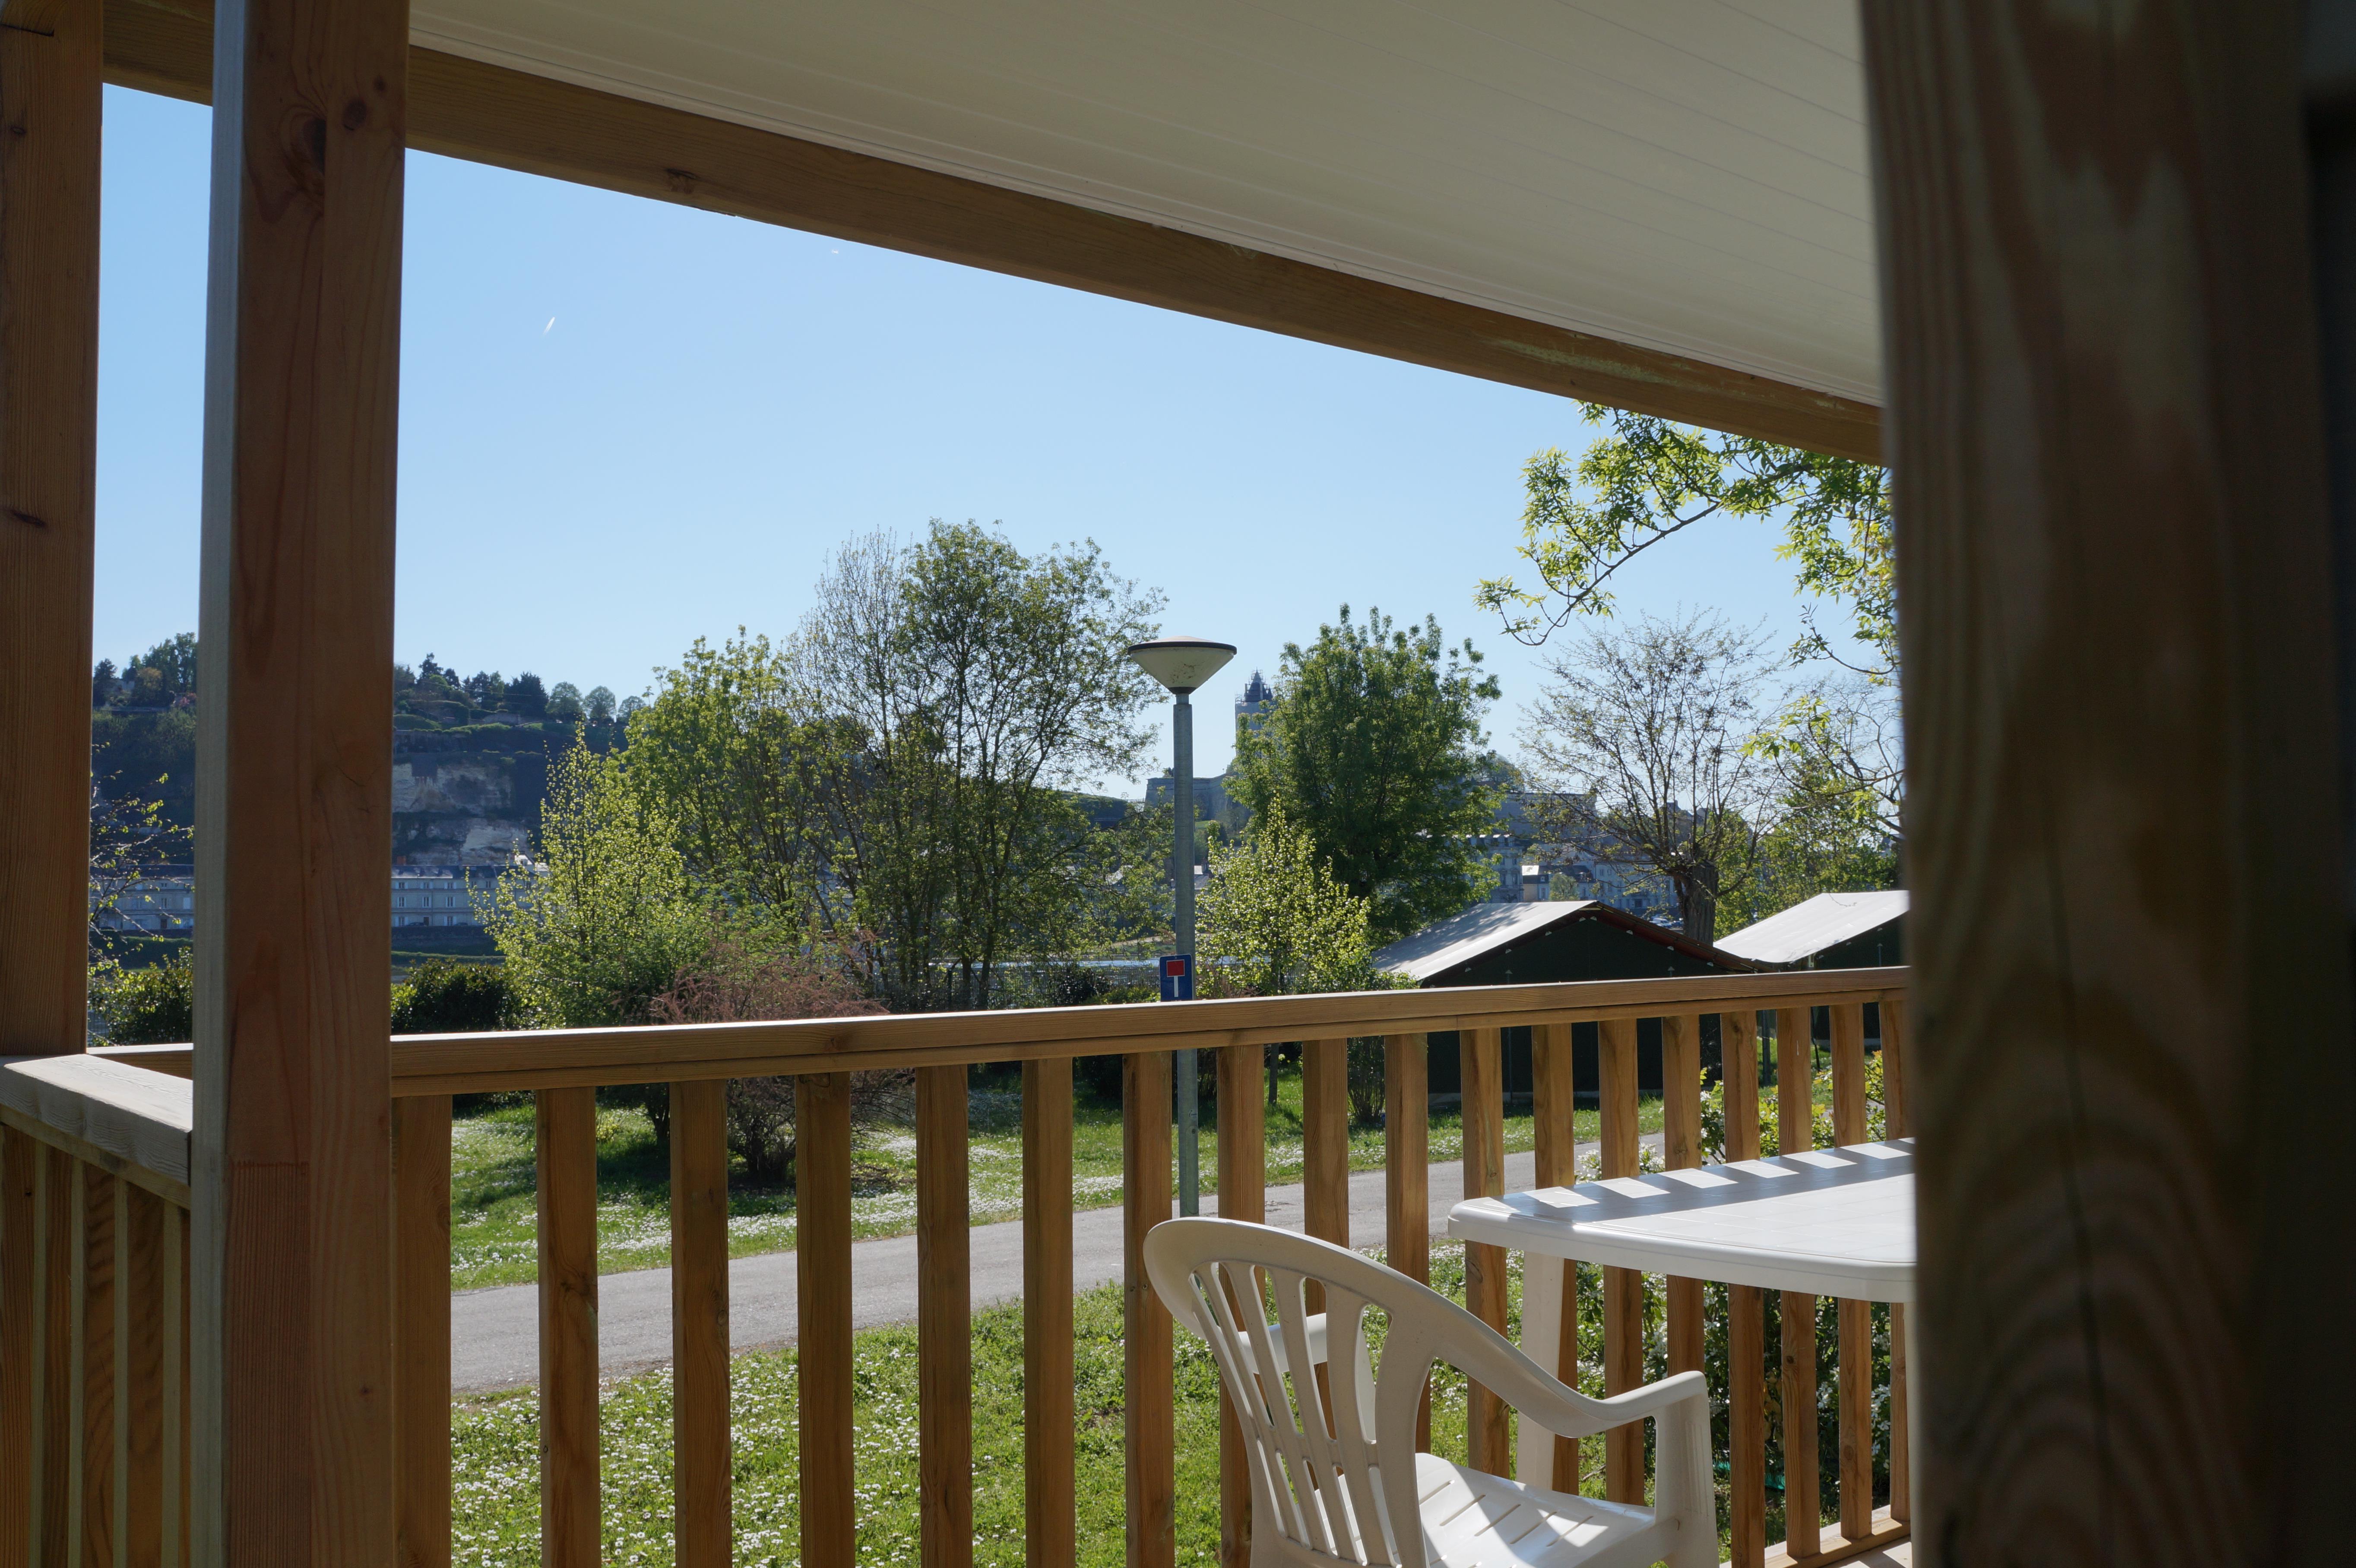 Mobil home Confort+ 24m² 2 chambres + terrasse couverte 7m² + bord de Loire + TV